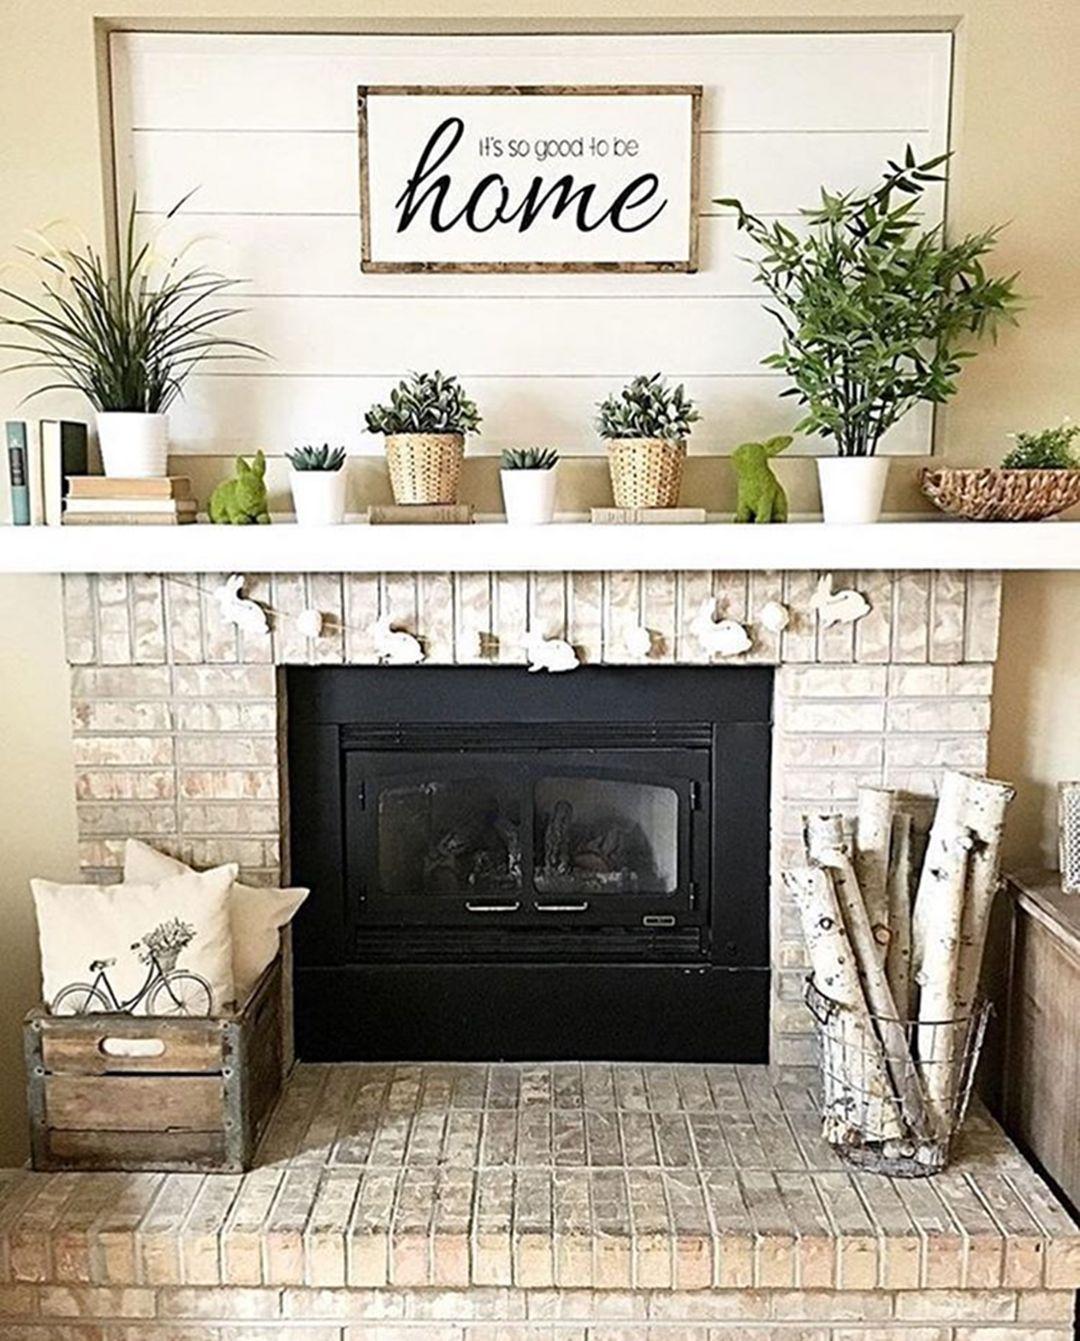 Fireplace Hearth Decor Unique Farmhouse Fireplace Mantel Decor Decor It S